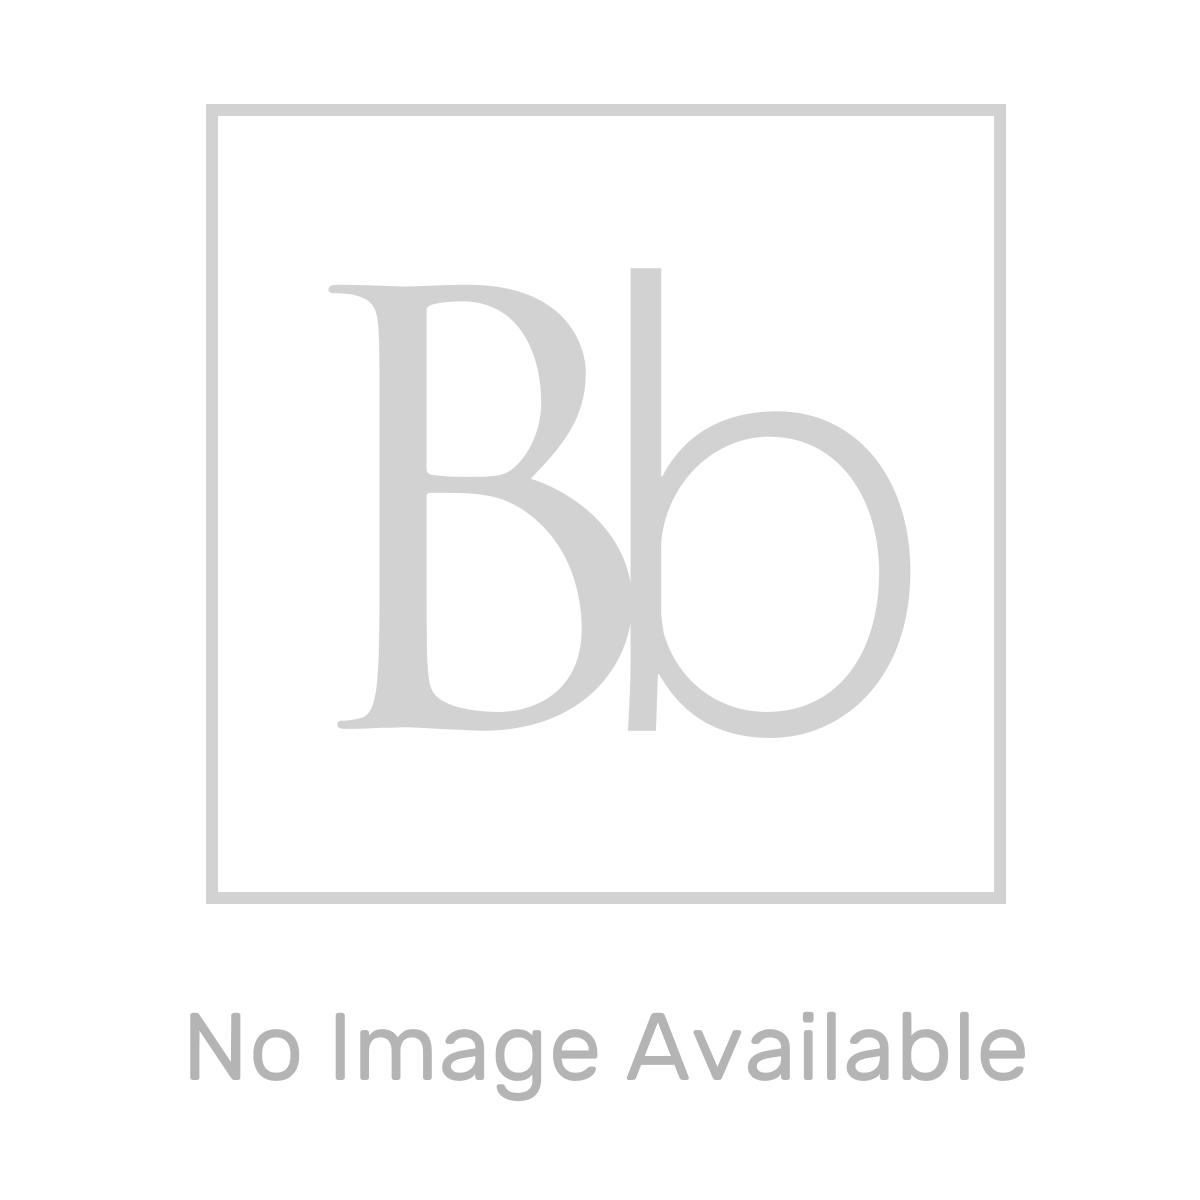 Frontline Aquaglass+ Sphere Black Tinted Sliding Shower Enclosure with Optional Side Panel